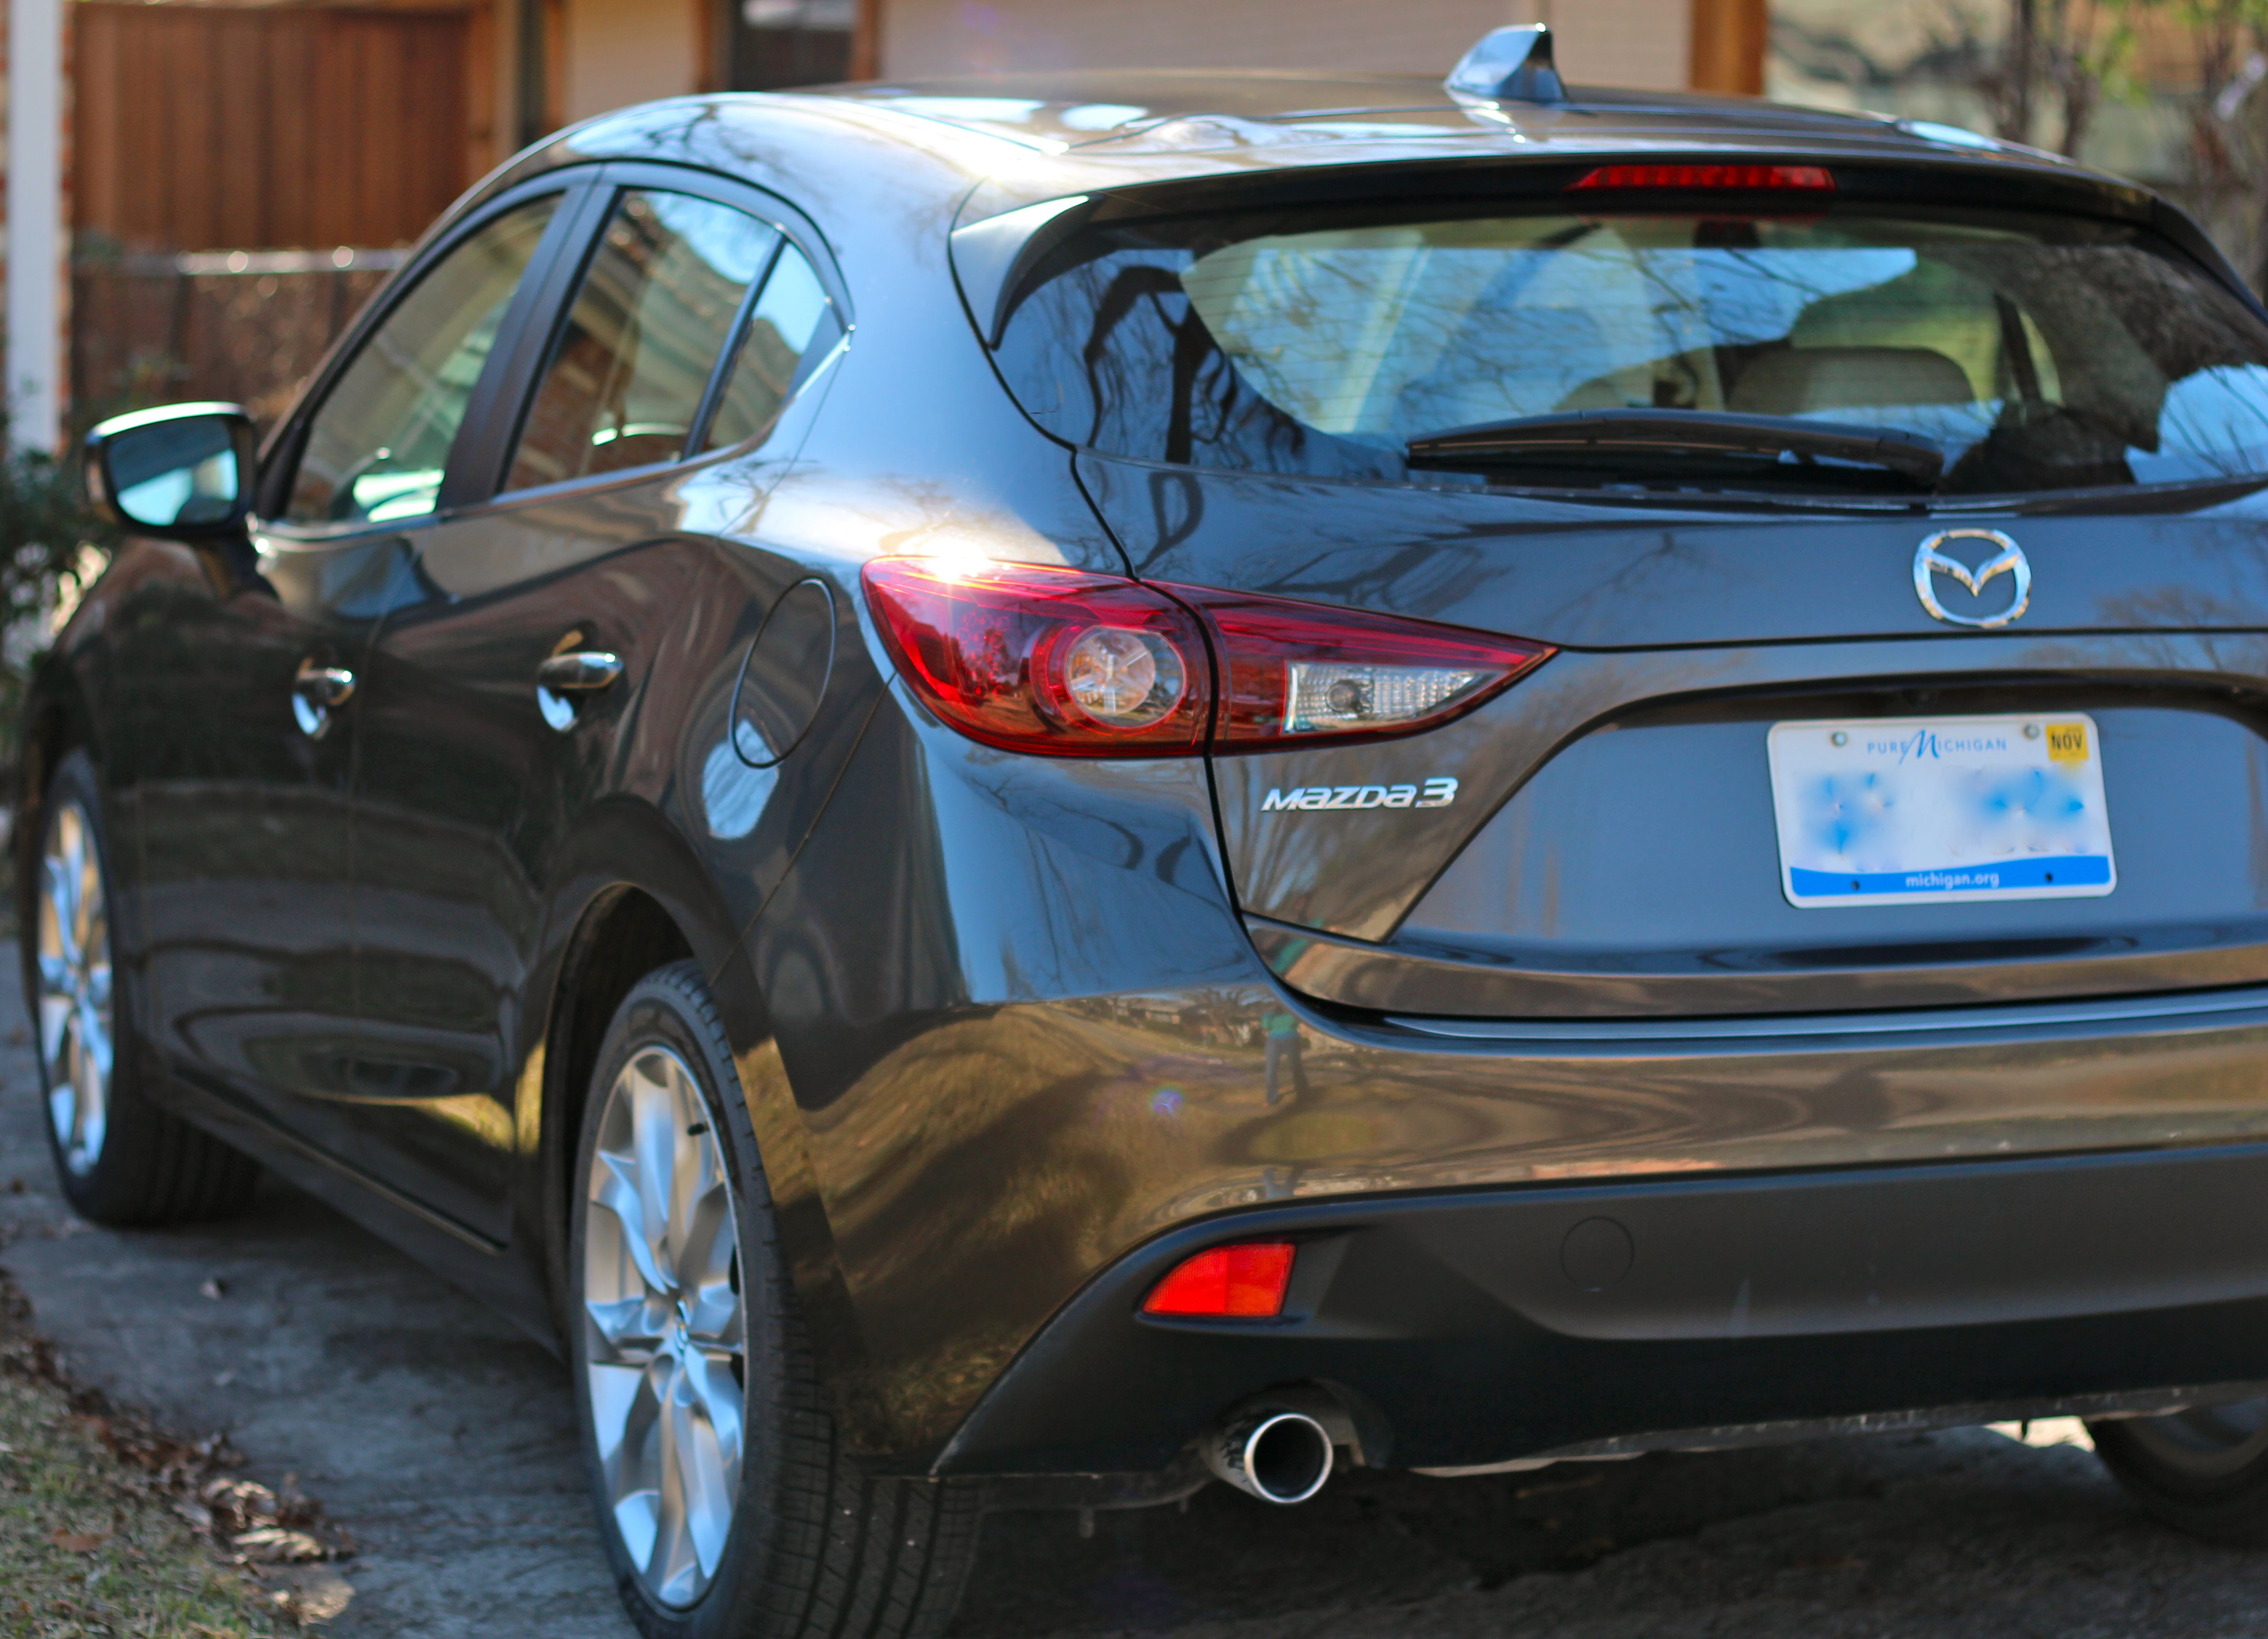 2014 Mazda 3 Tours Efficiently Around Town - Real Posh Mom